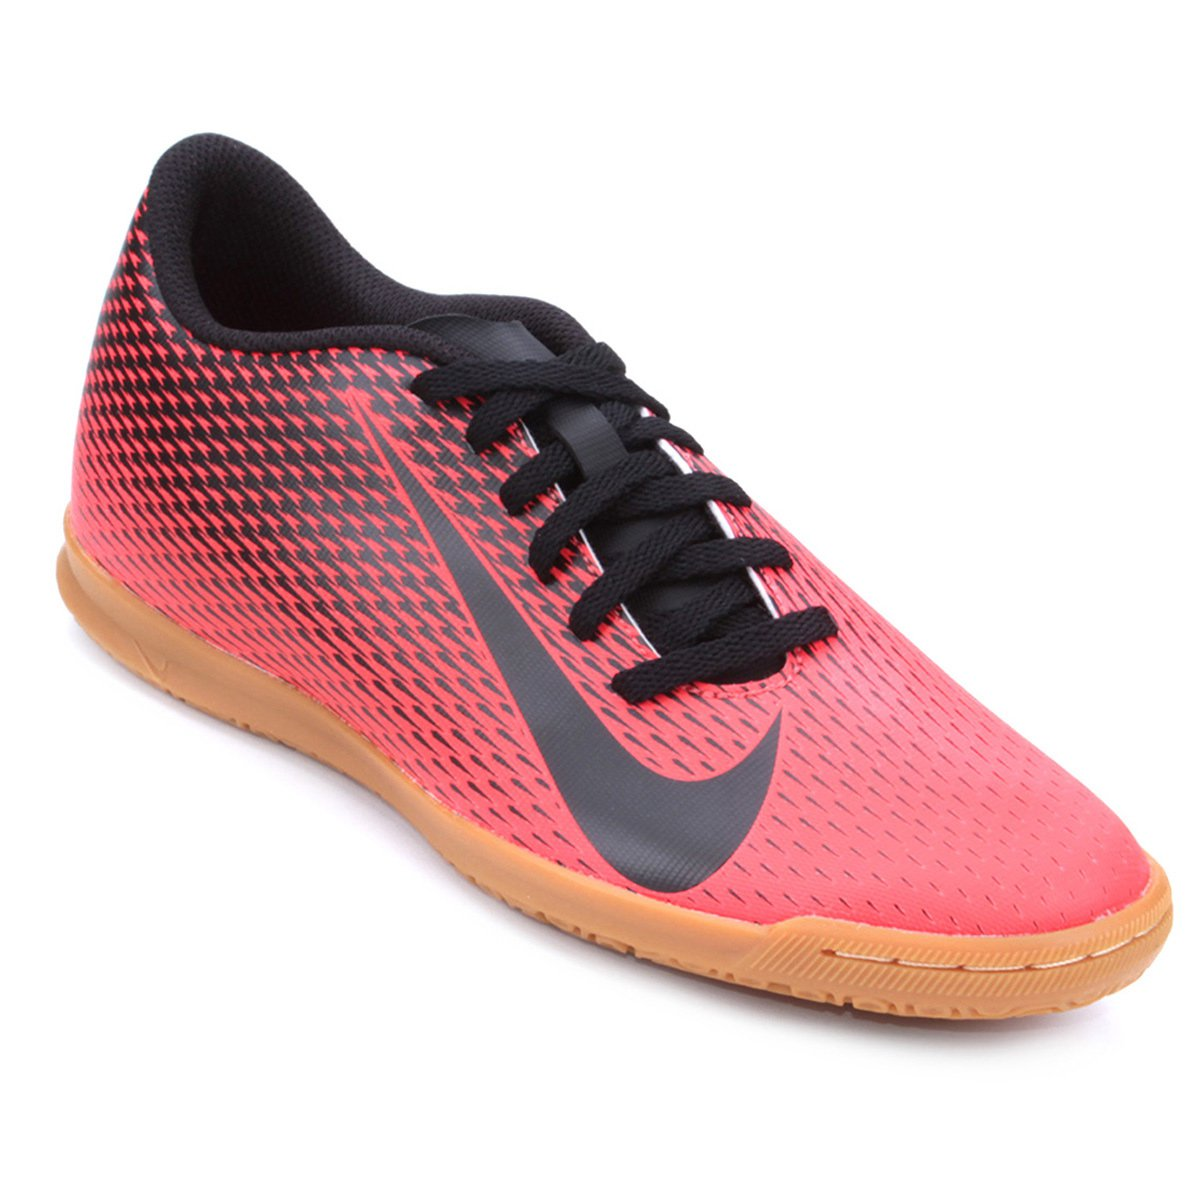 63358dafdc Chuteira Futsal Nike Bravata 2 IC - Preto - Compre Agora